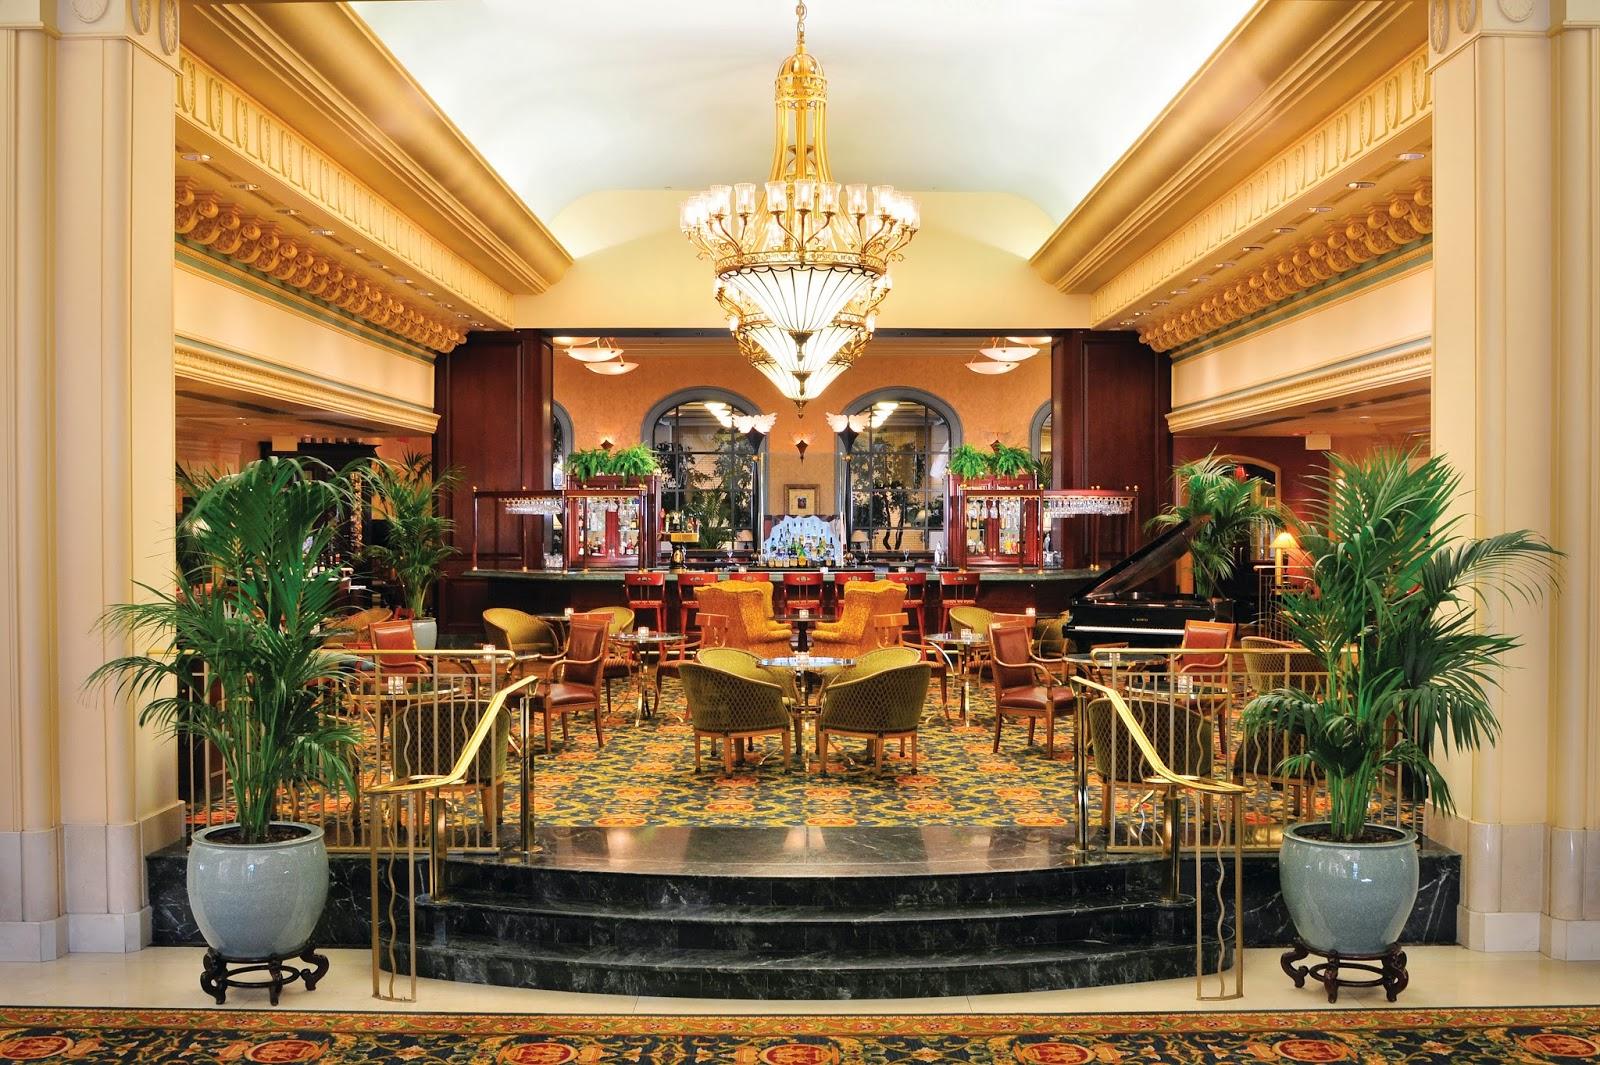 The Fairmont Hotel Vancouver to undergo 12 million